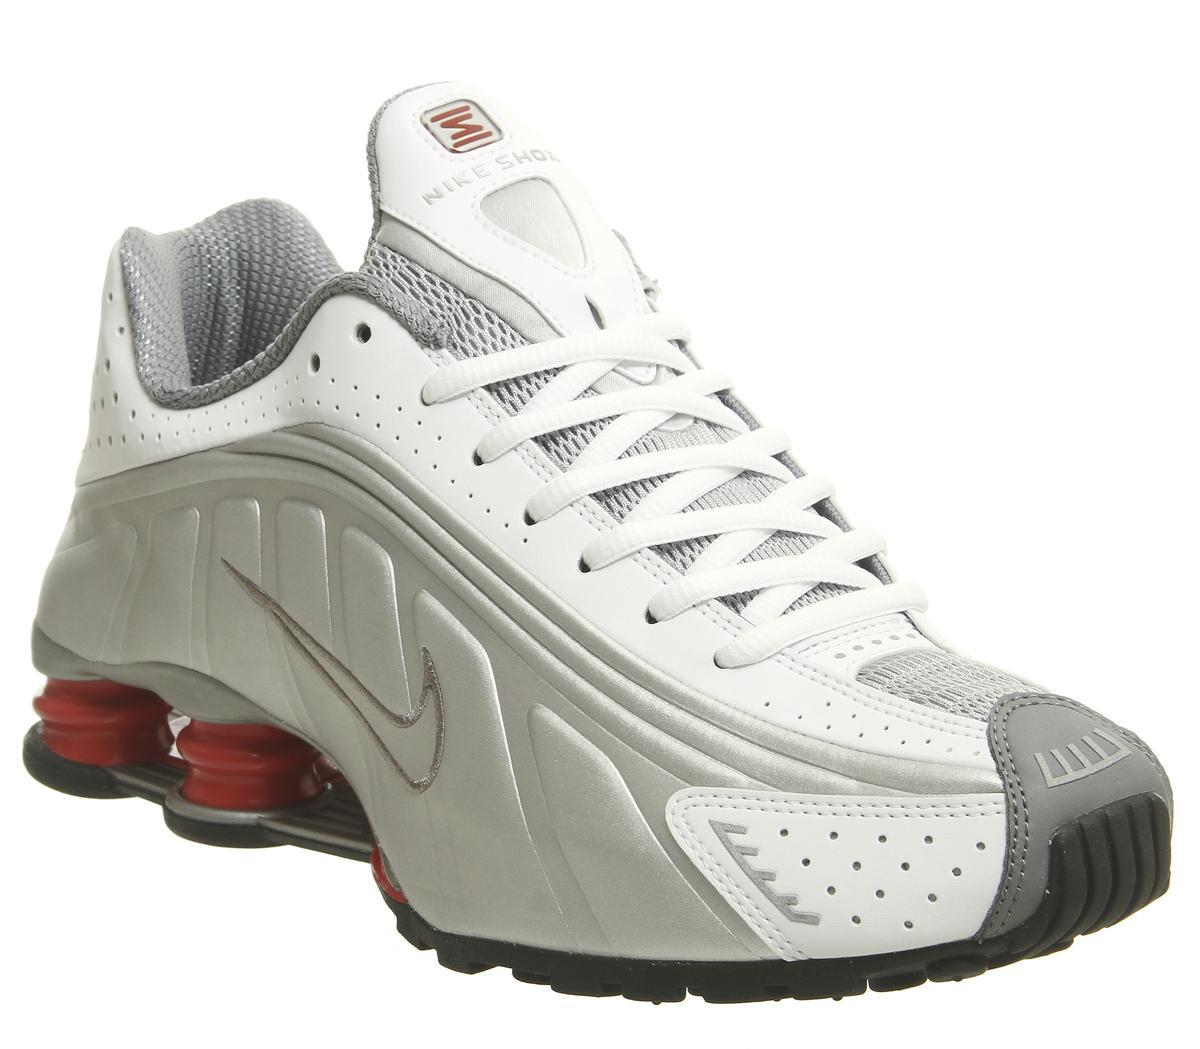 Nike Shox R4 Trainers